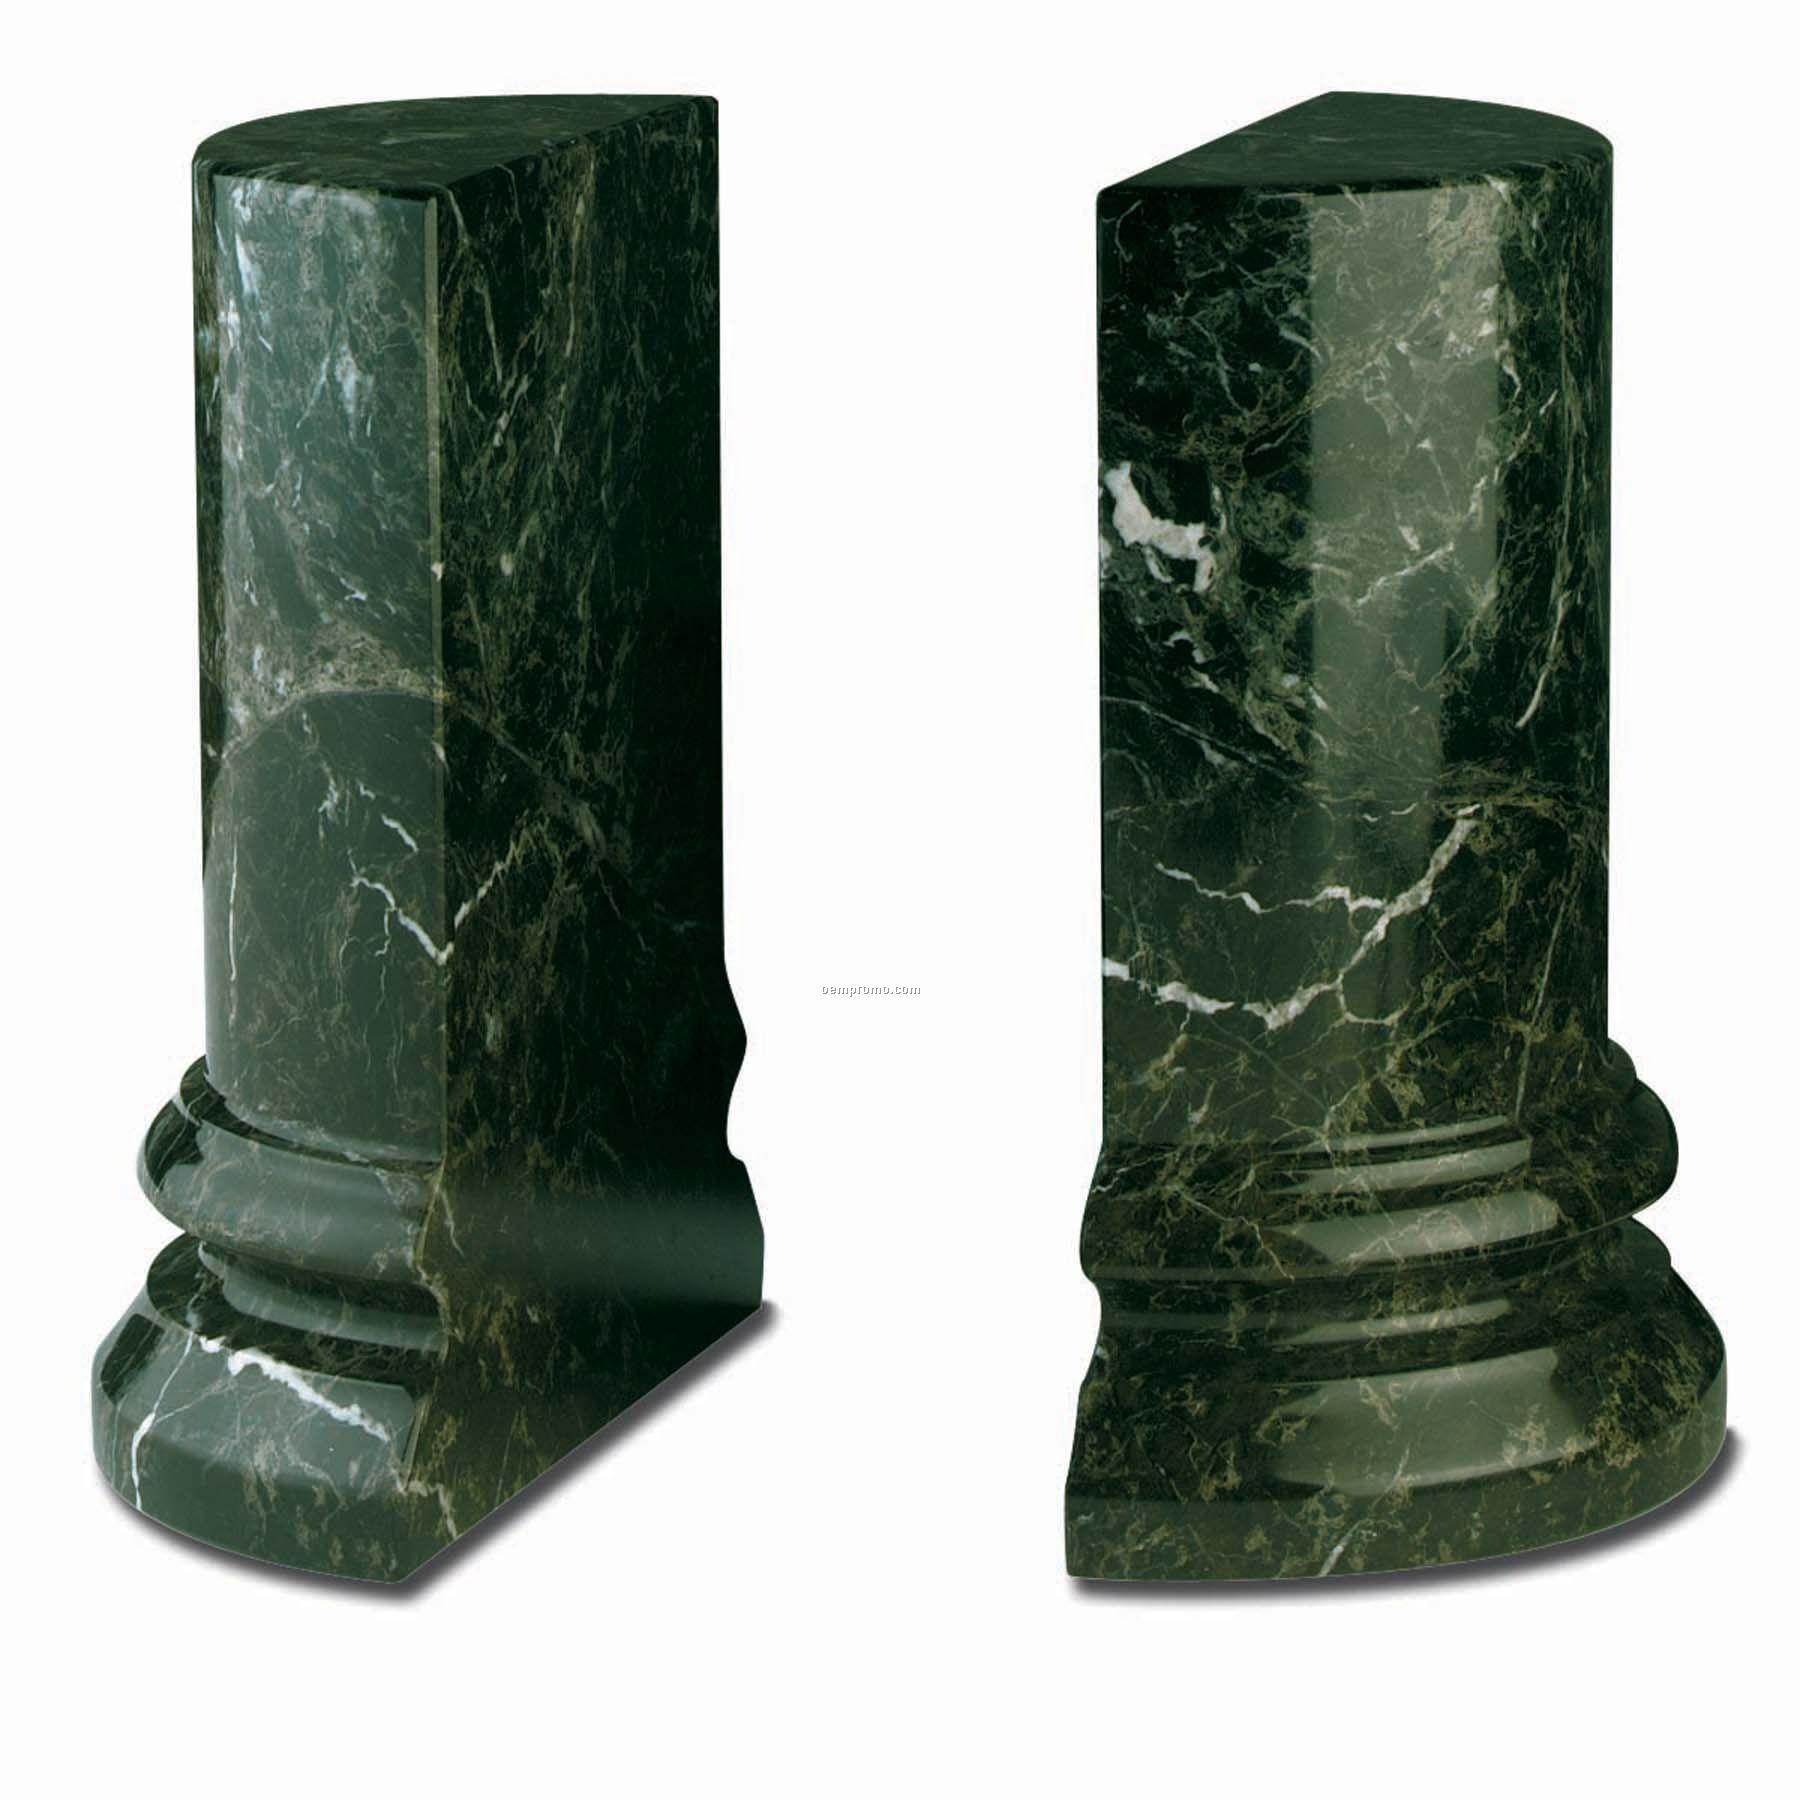 Round Bookends Column - Jade Leaf Green